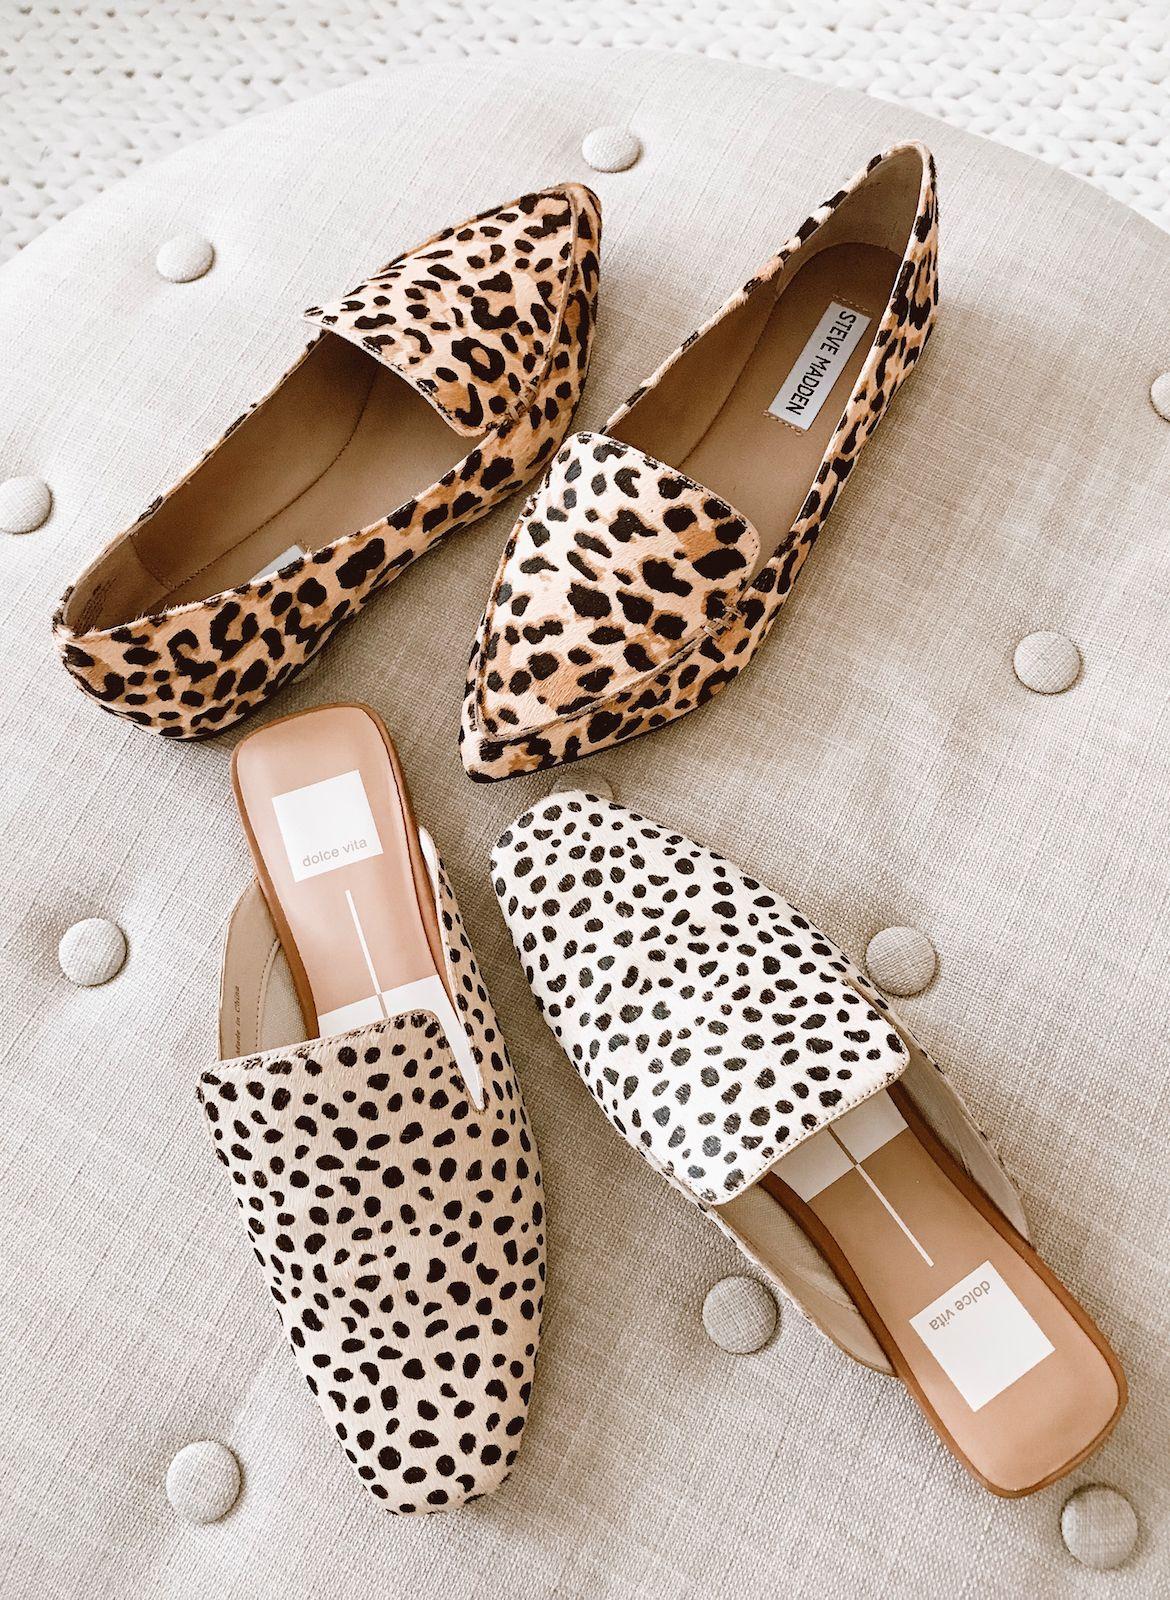 b373e8fe11f Dressing Room 8.17.18 - Featuring Leopard Print Shoes